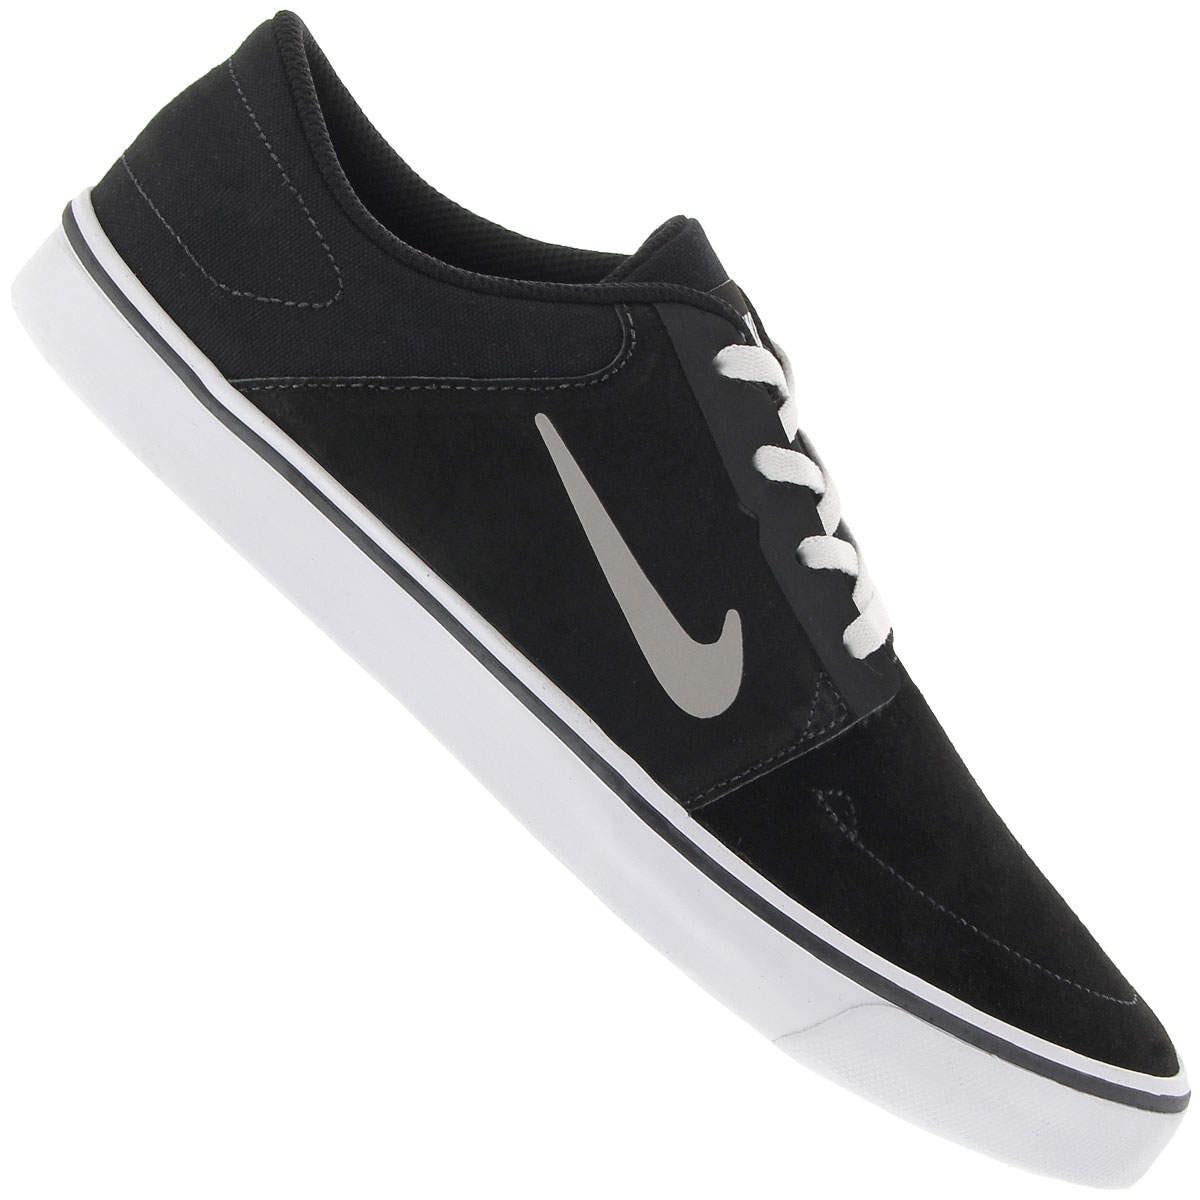 fee6f0ba90 Bizz Store - Tênis Masculino Nike SB Portmore Skate Preto/Cinza